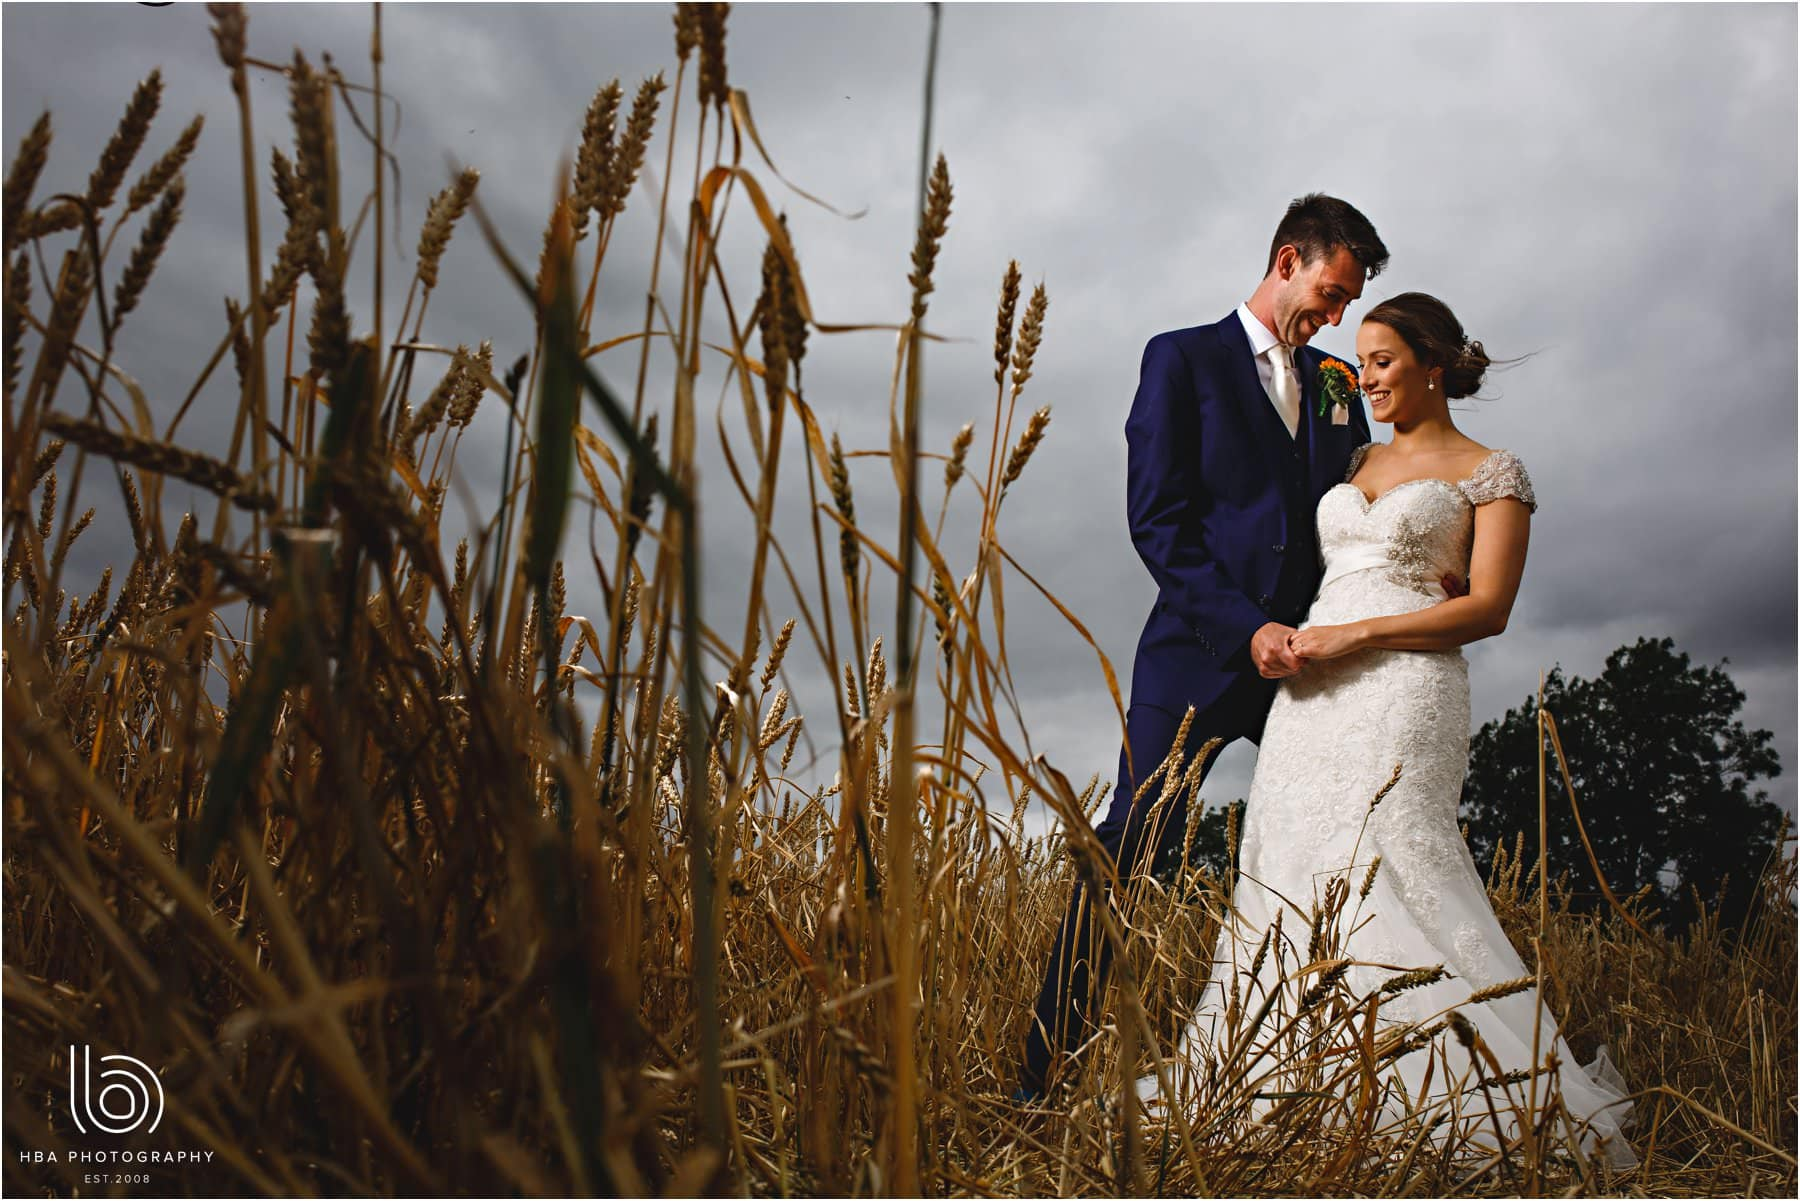 the bride & groom in the cornfield